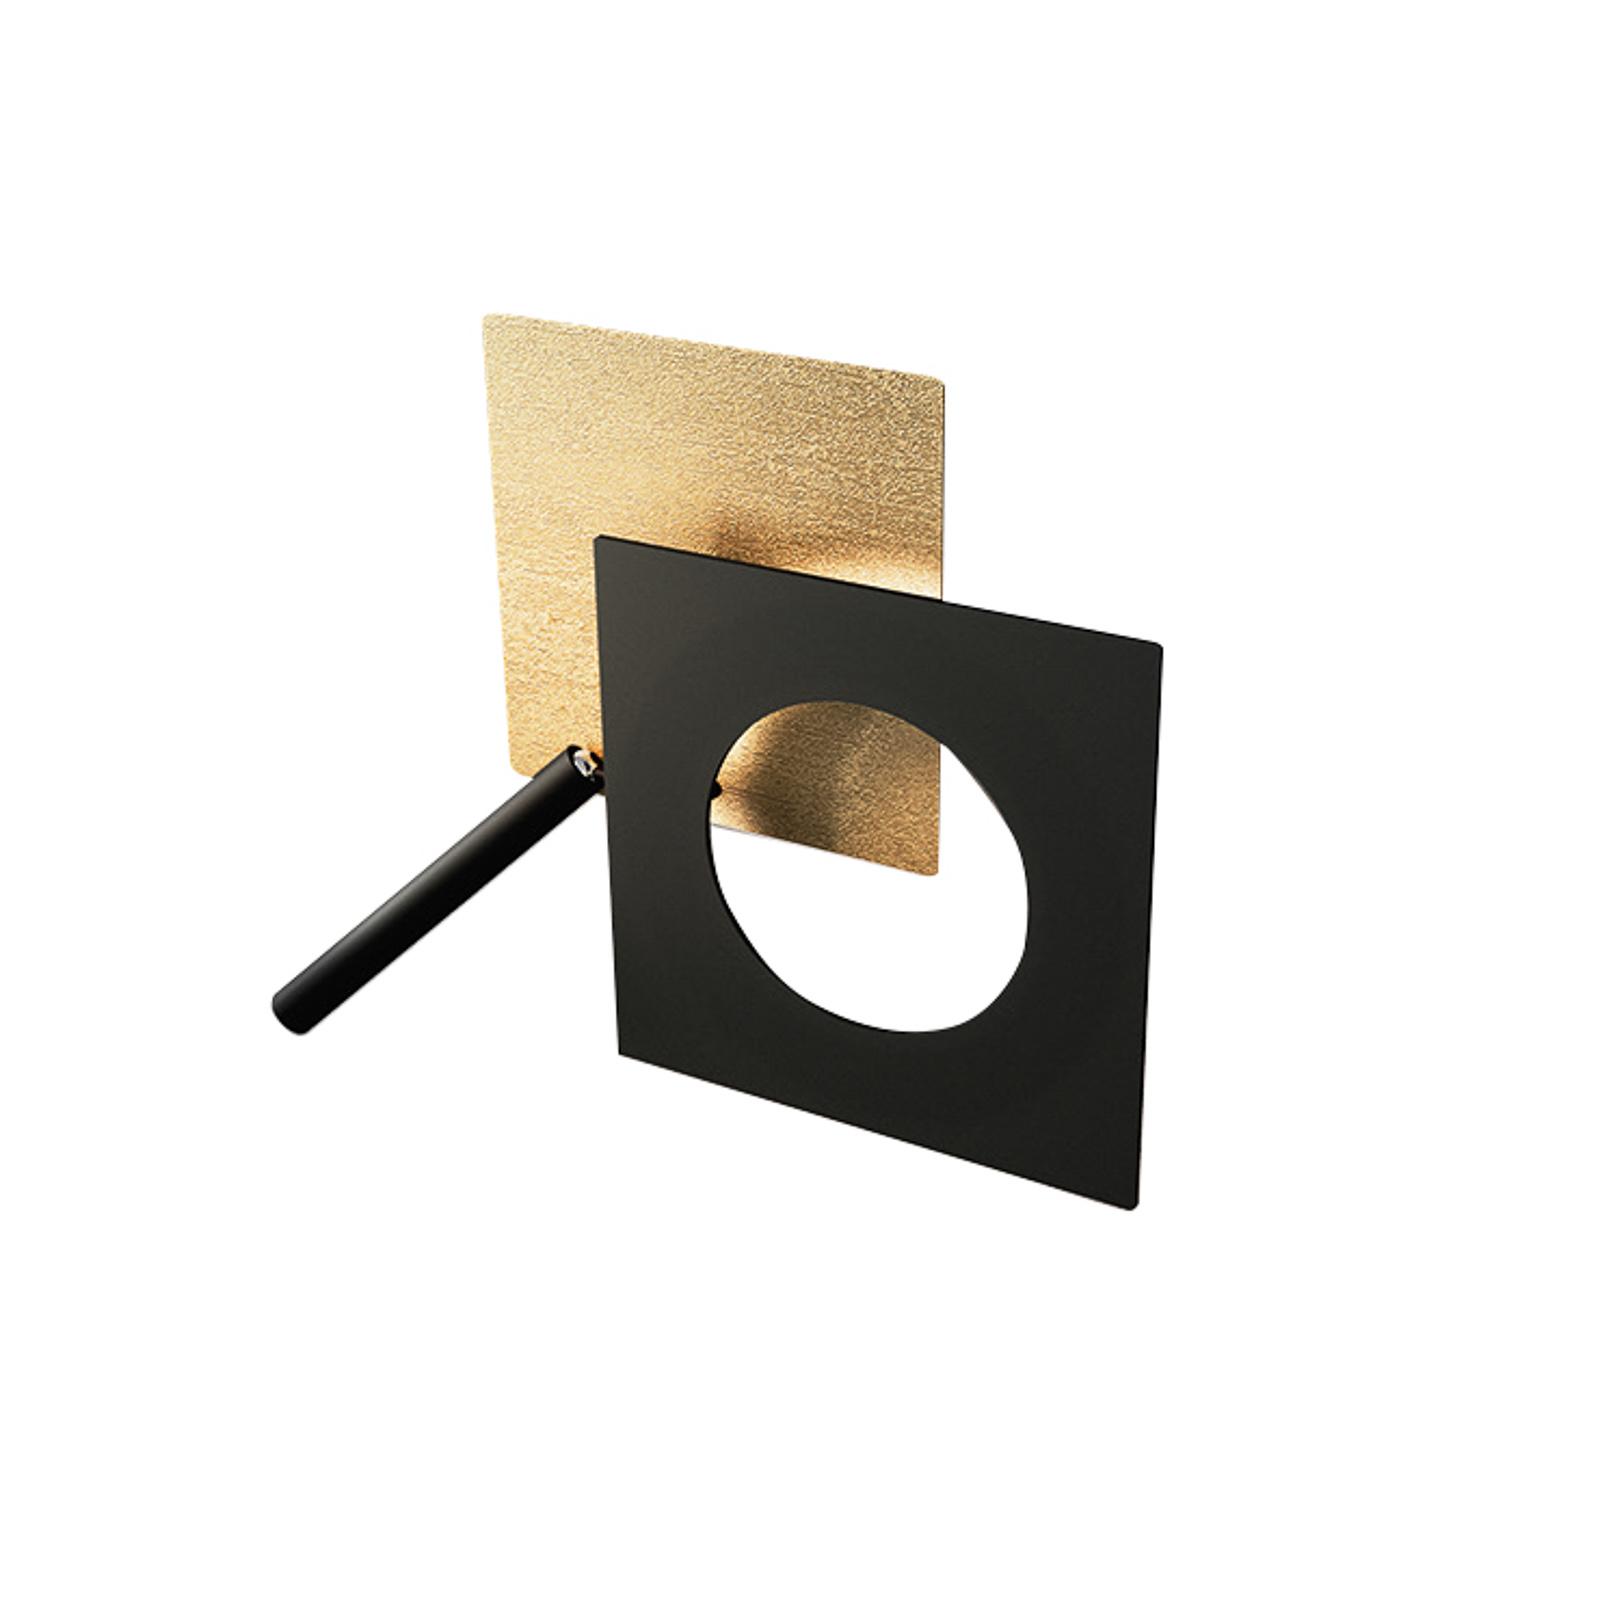 ICONE LED-Wandleuchte Petra 21.L, gold, schwarz